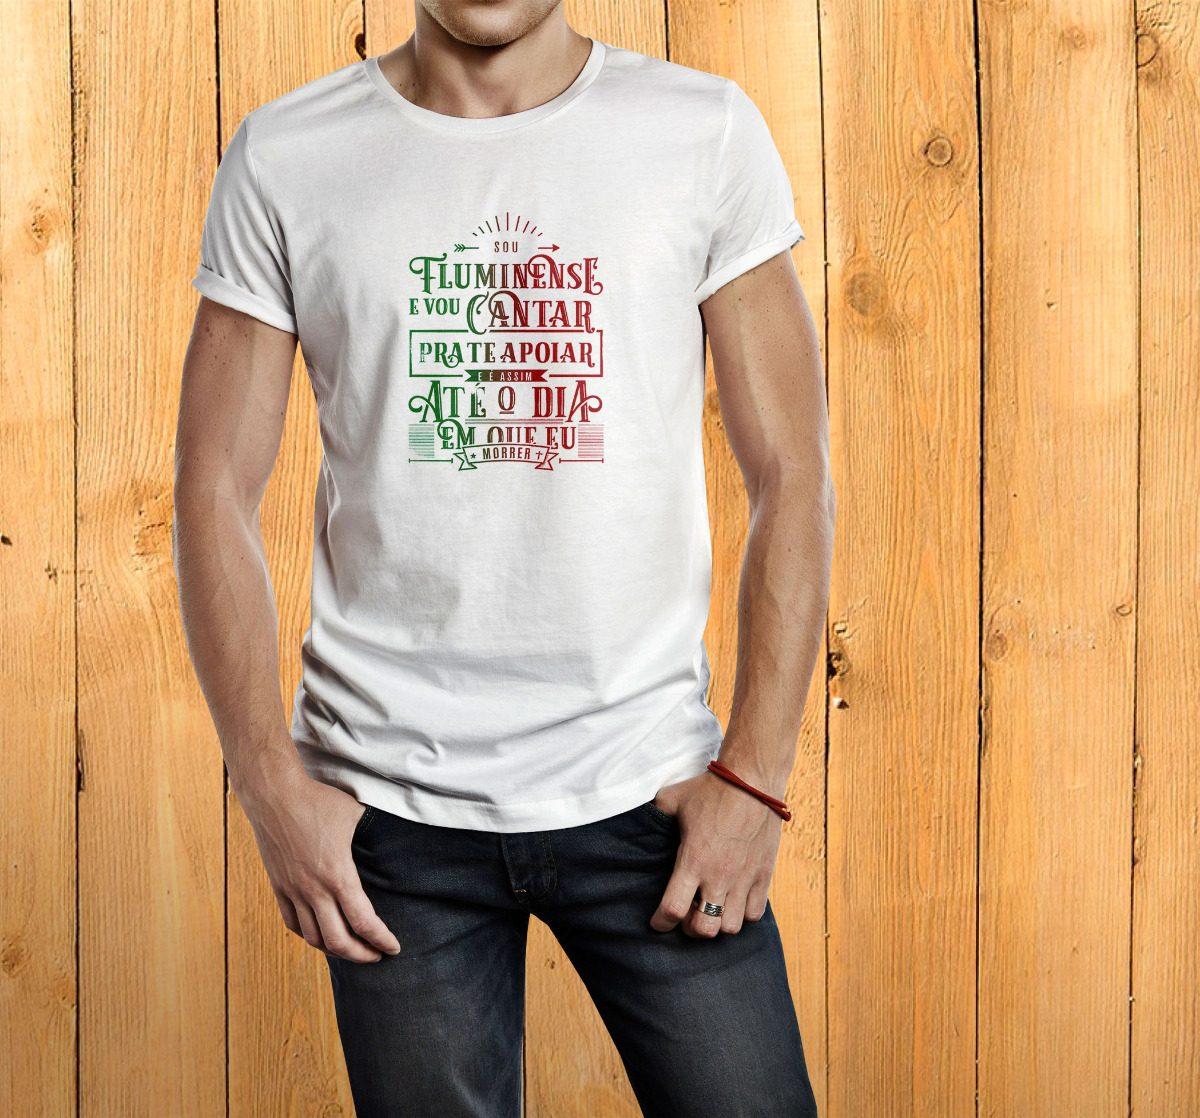 camiseta masculina fluminense tricolor social. Carregando zoom. 6492a2e6adb1c